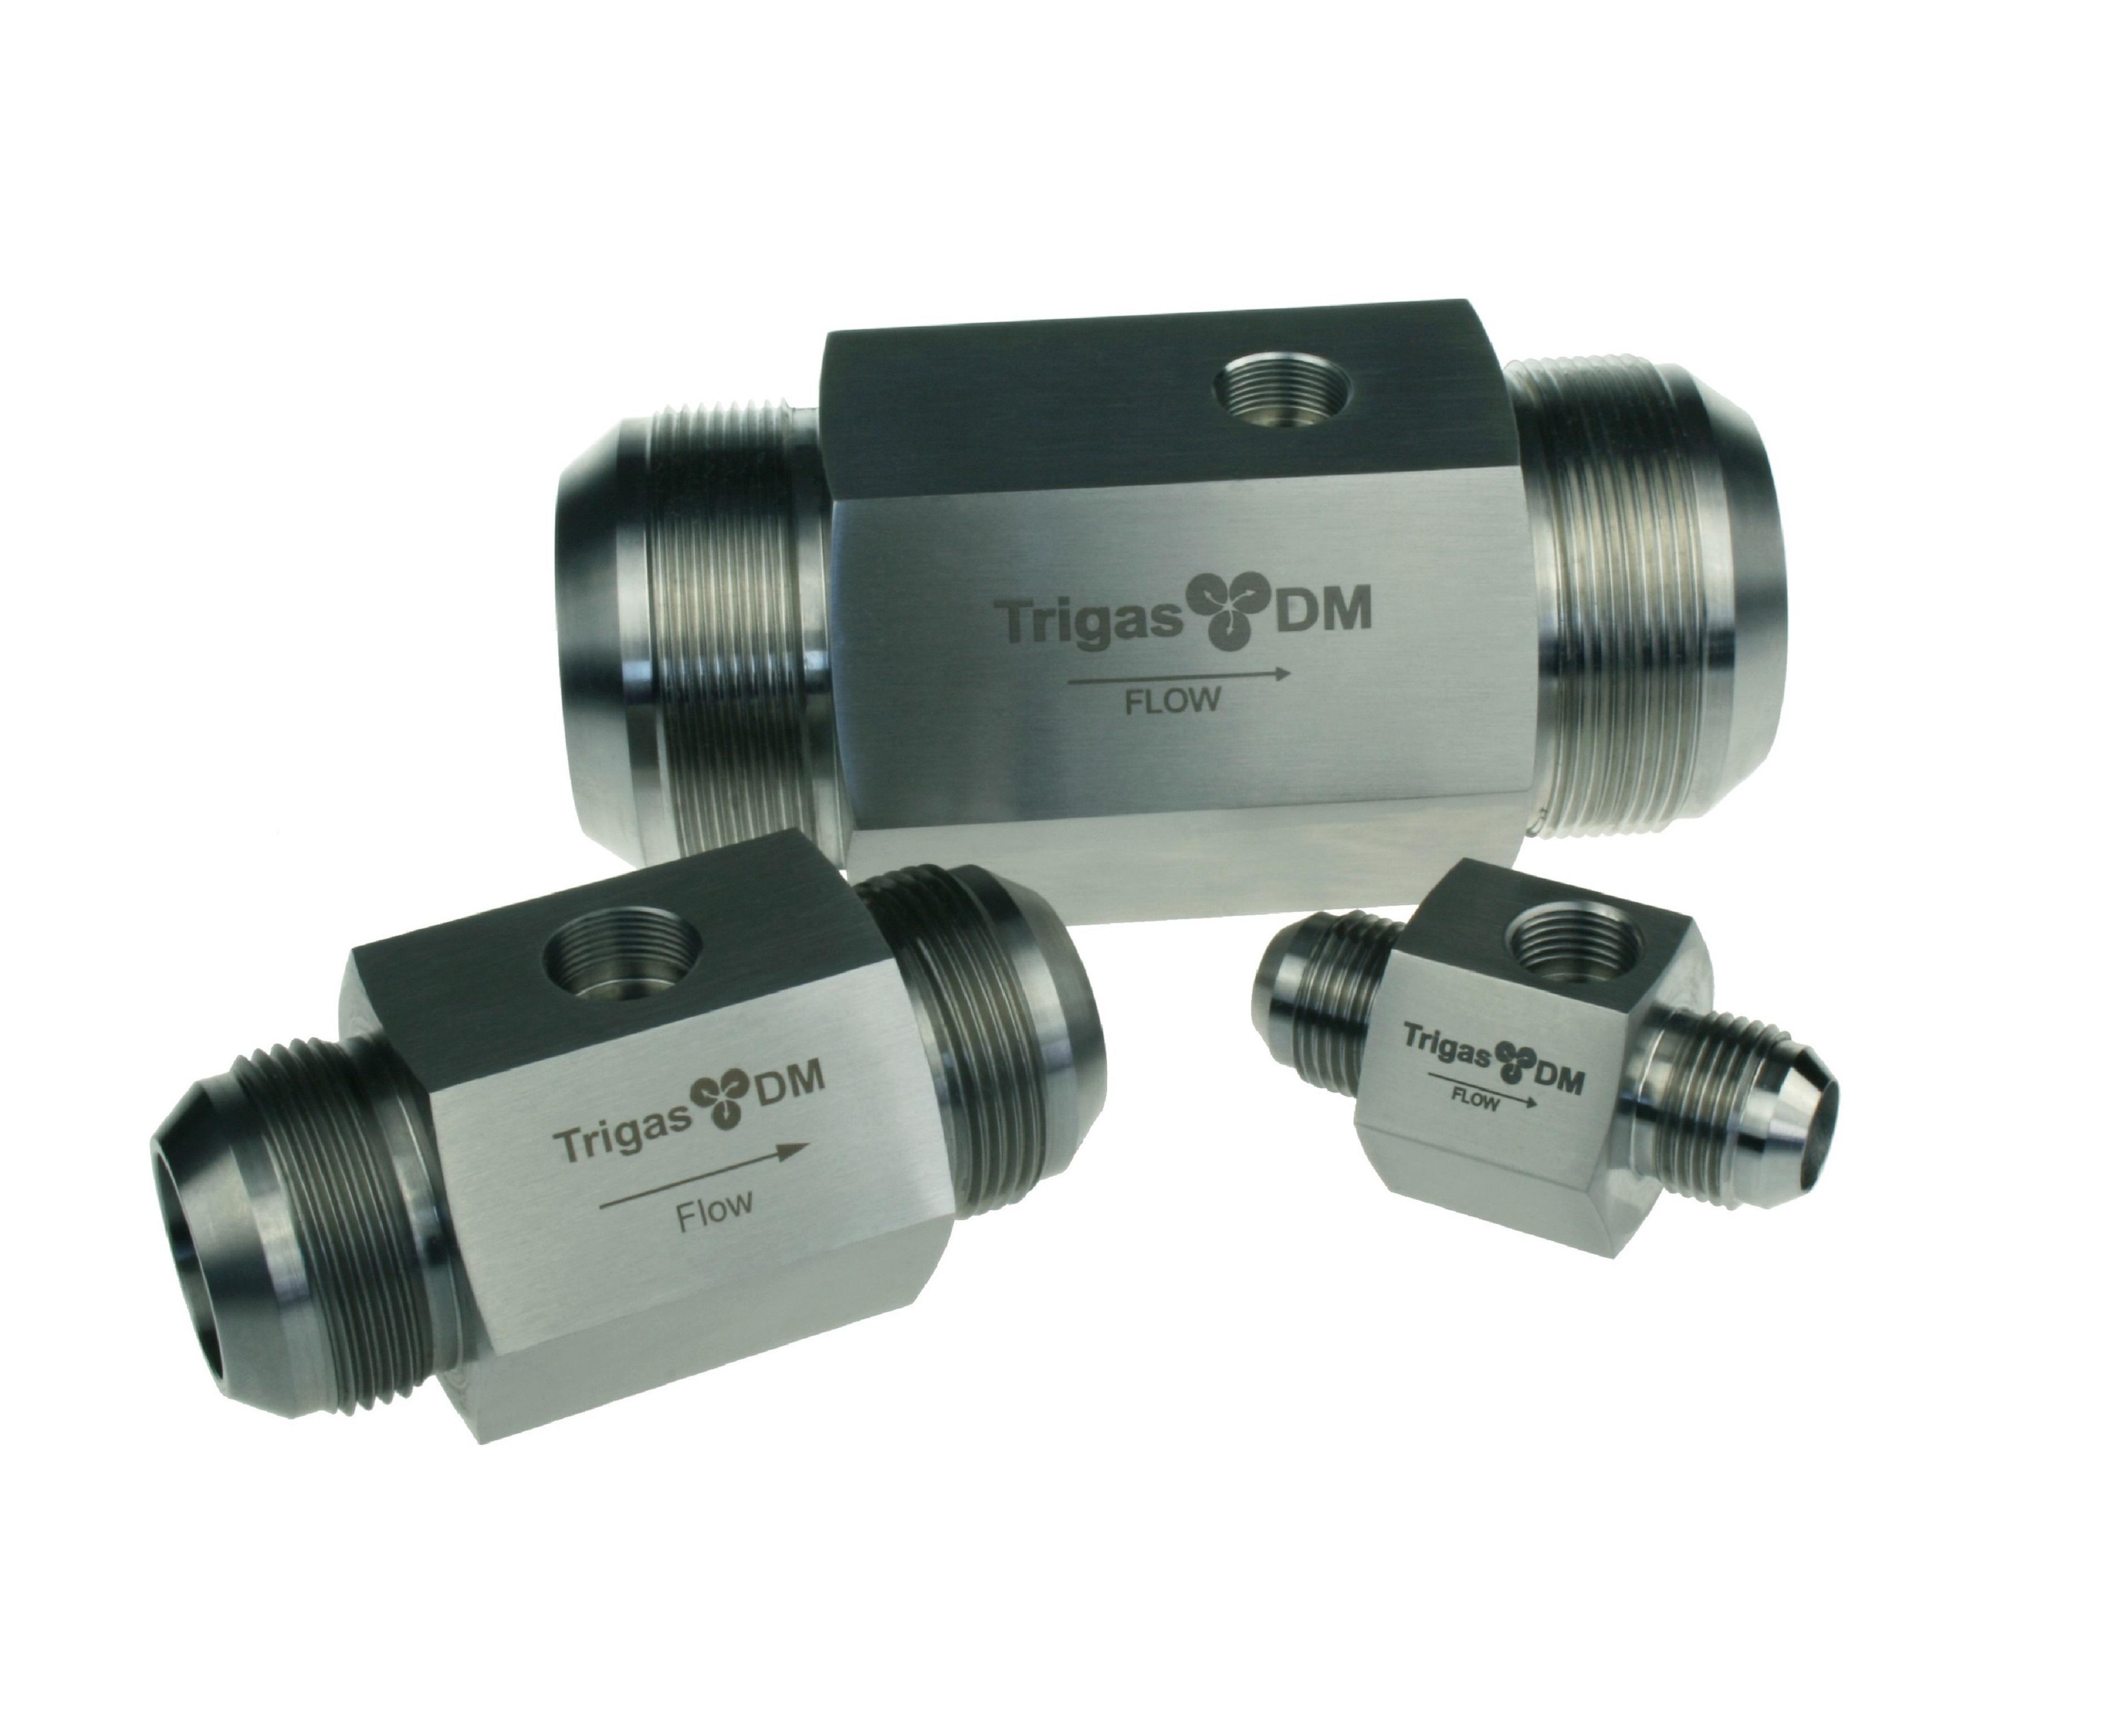 TrigasDM präzise Durchflussmesstechnik